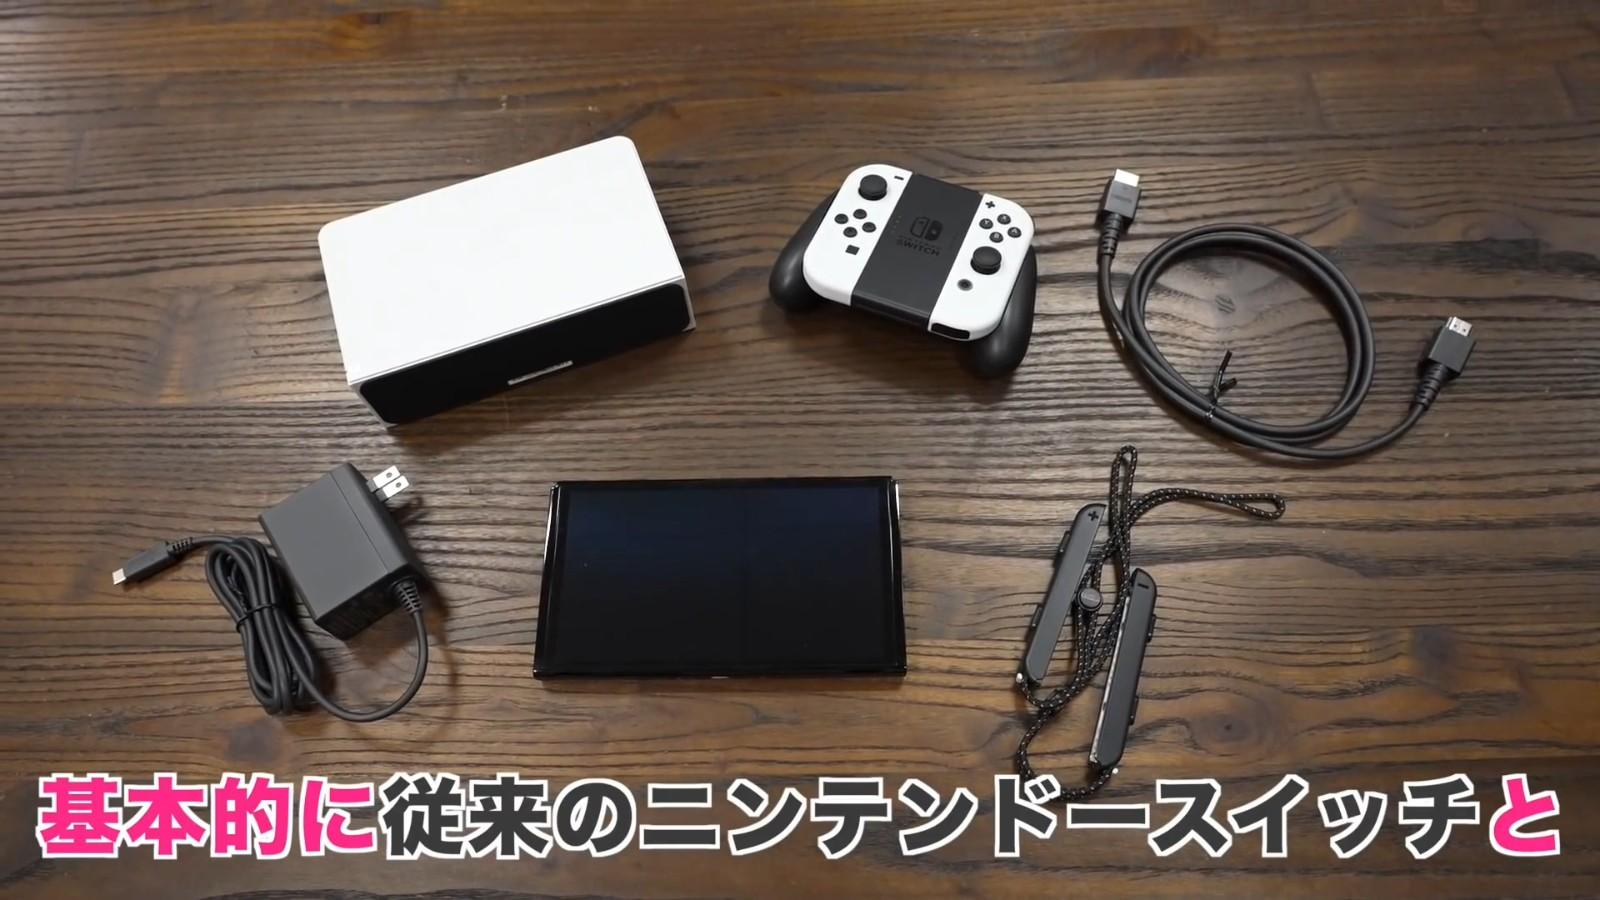 OLED Switch主机开箱和上手视频来了